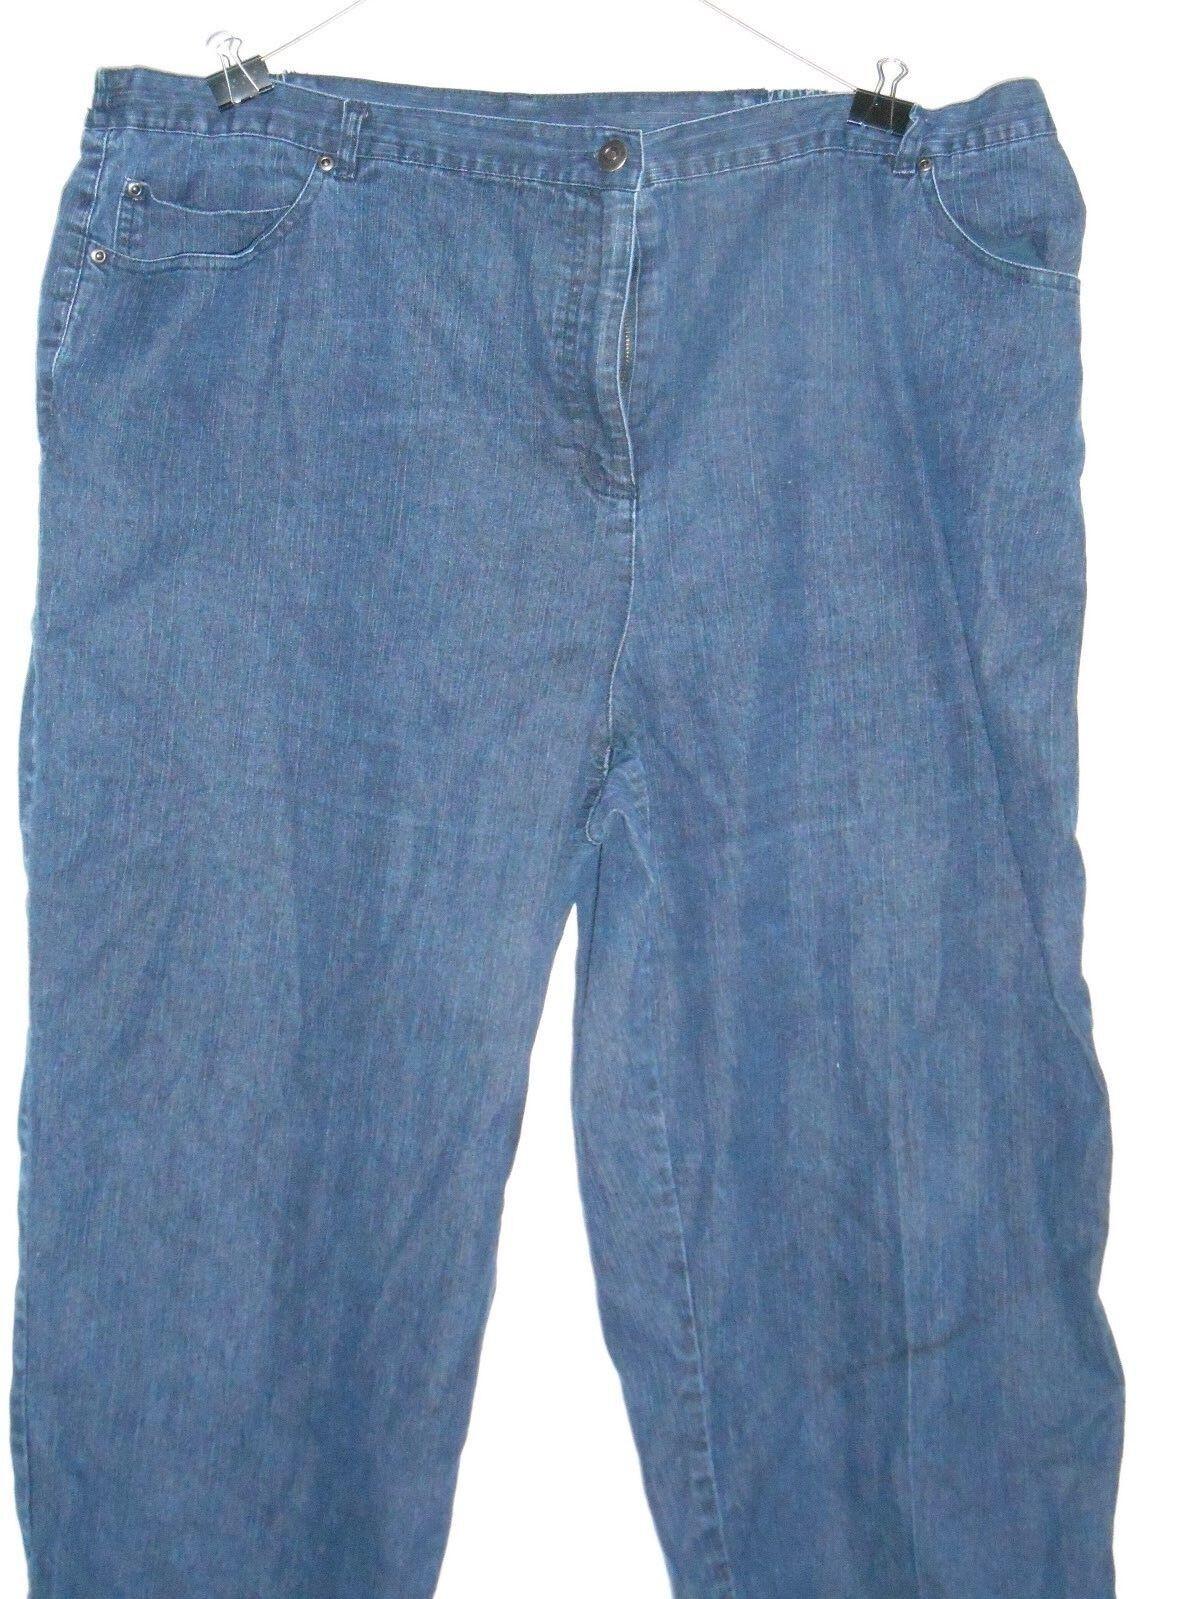 Ruby Rd Denim Jeans Pants Plus Size 24W Elastic Sides